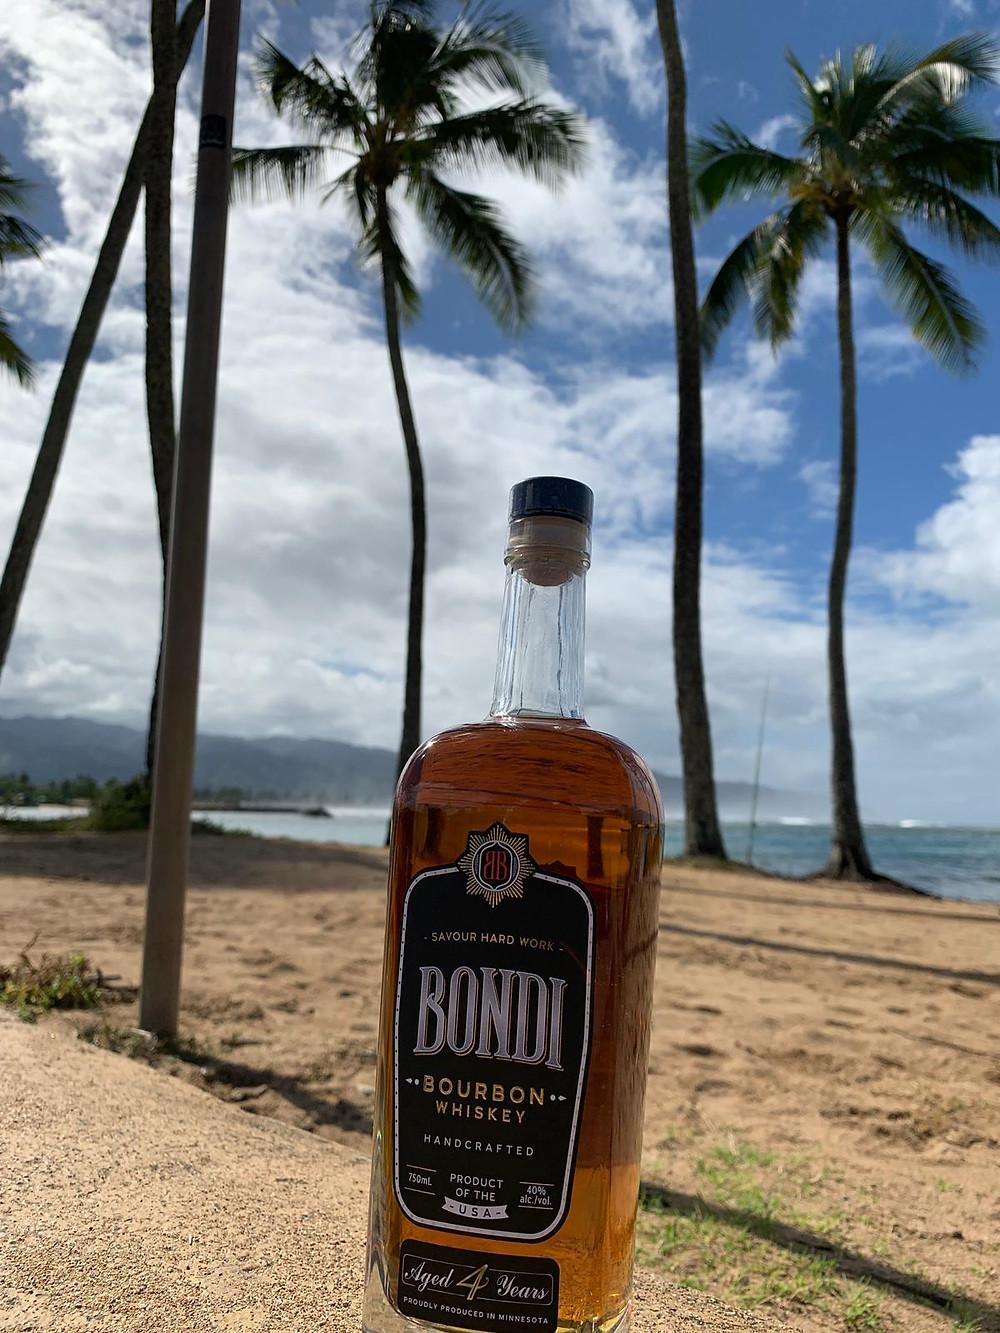 Bondi Bourbon in Hawaii